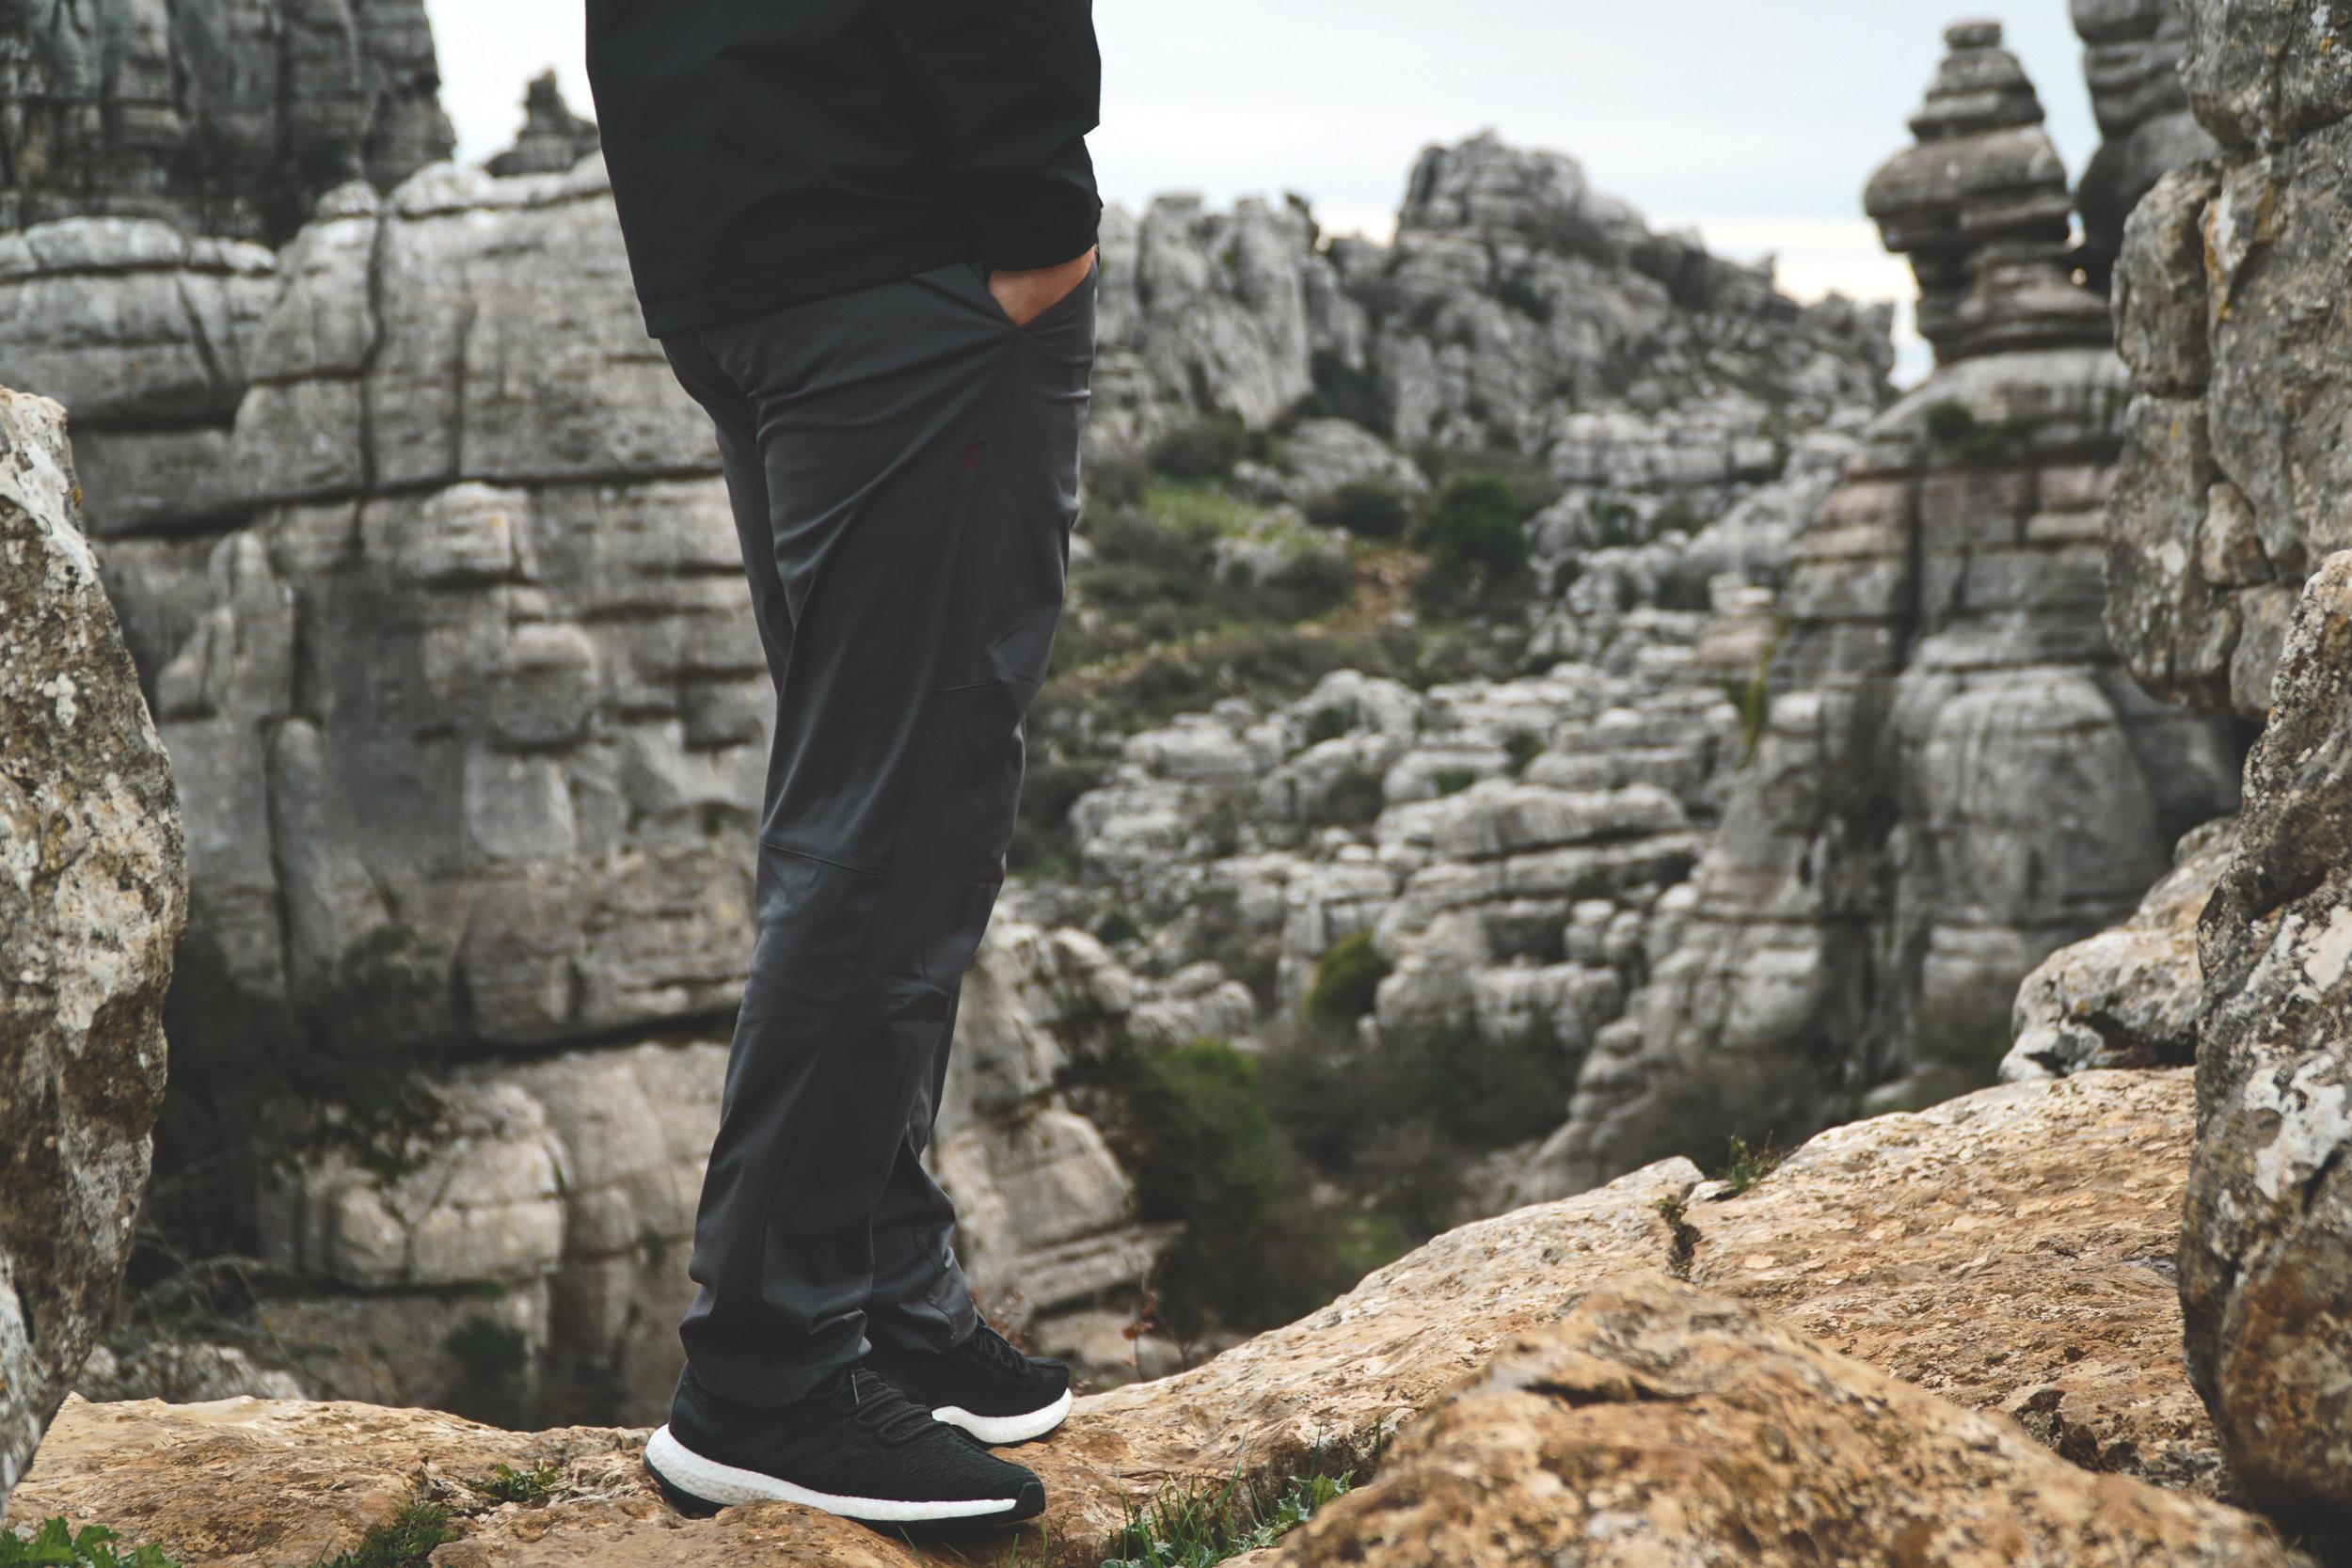 Adidas Pureboost Northwest Shoe Review